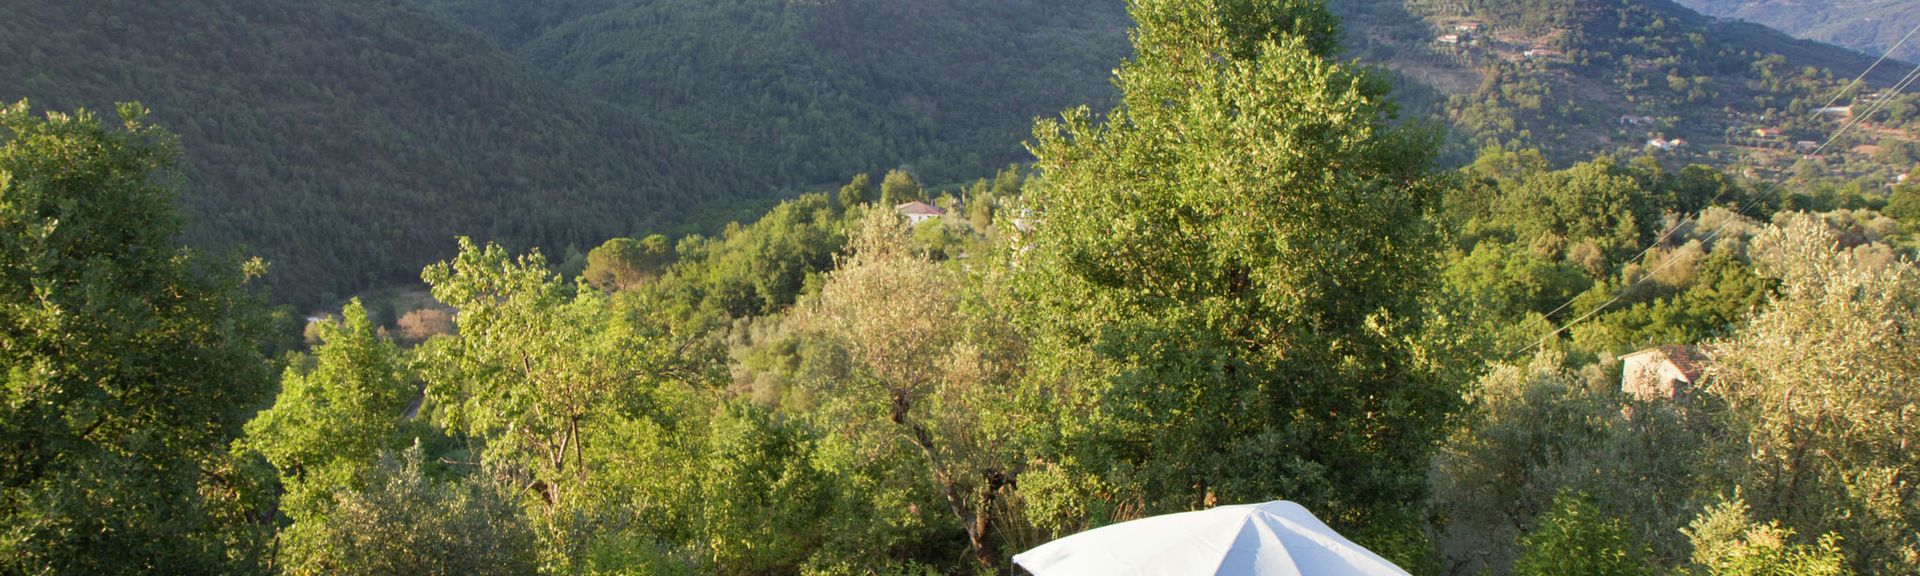 Ascea, Campania, Italy